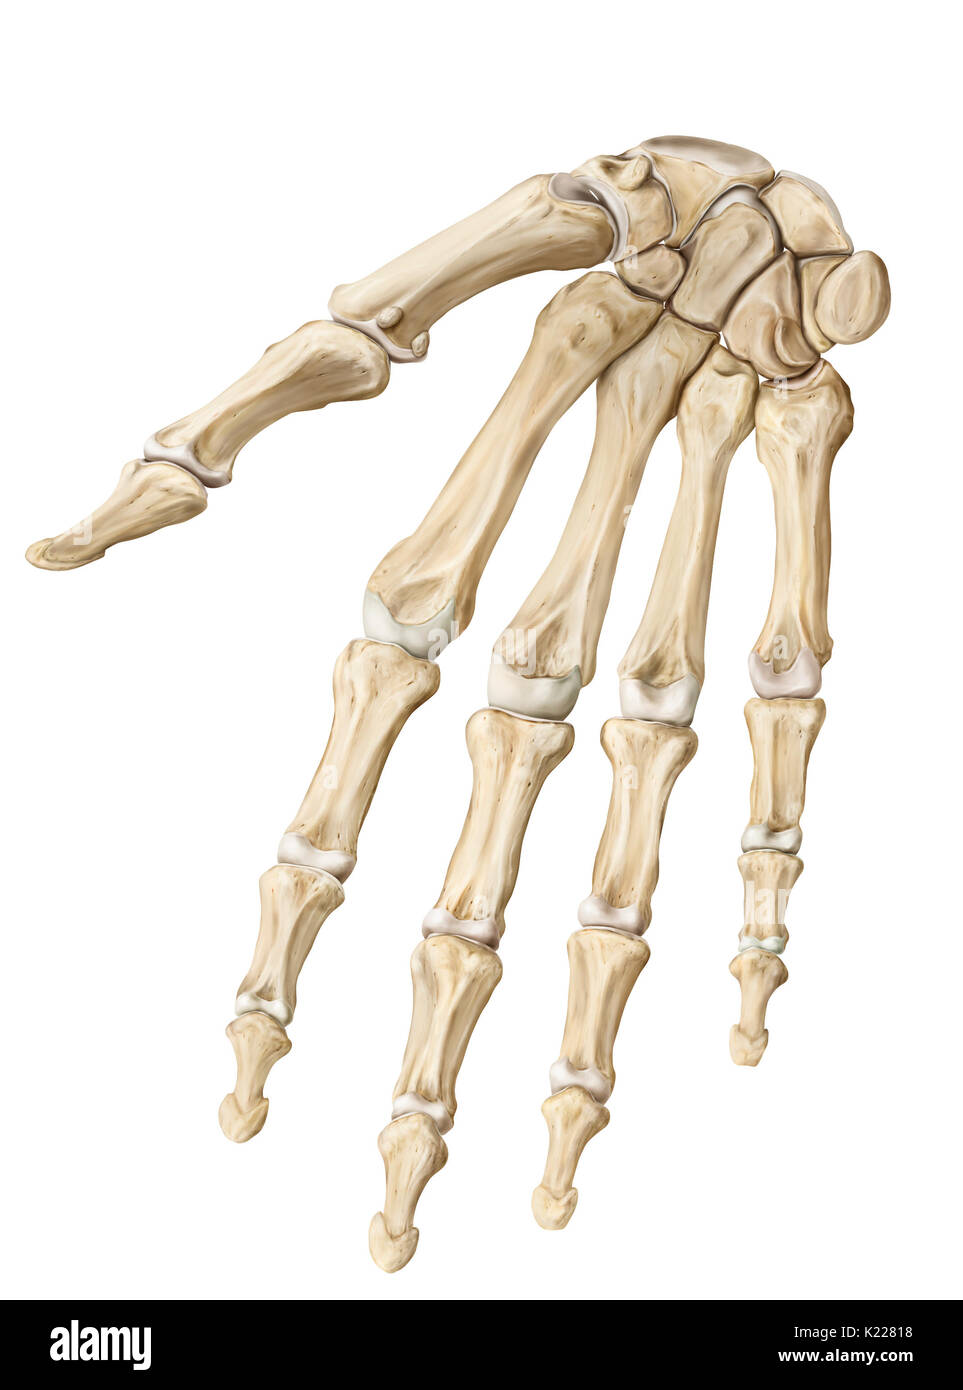 Bone Of The Hand Anterior View Stockfotos & Bone Of The Hand ...